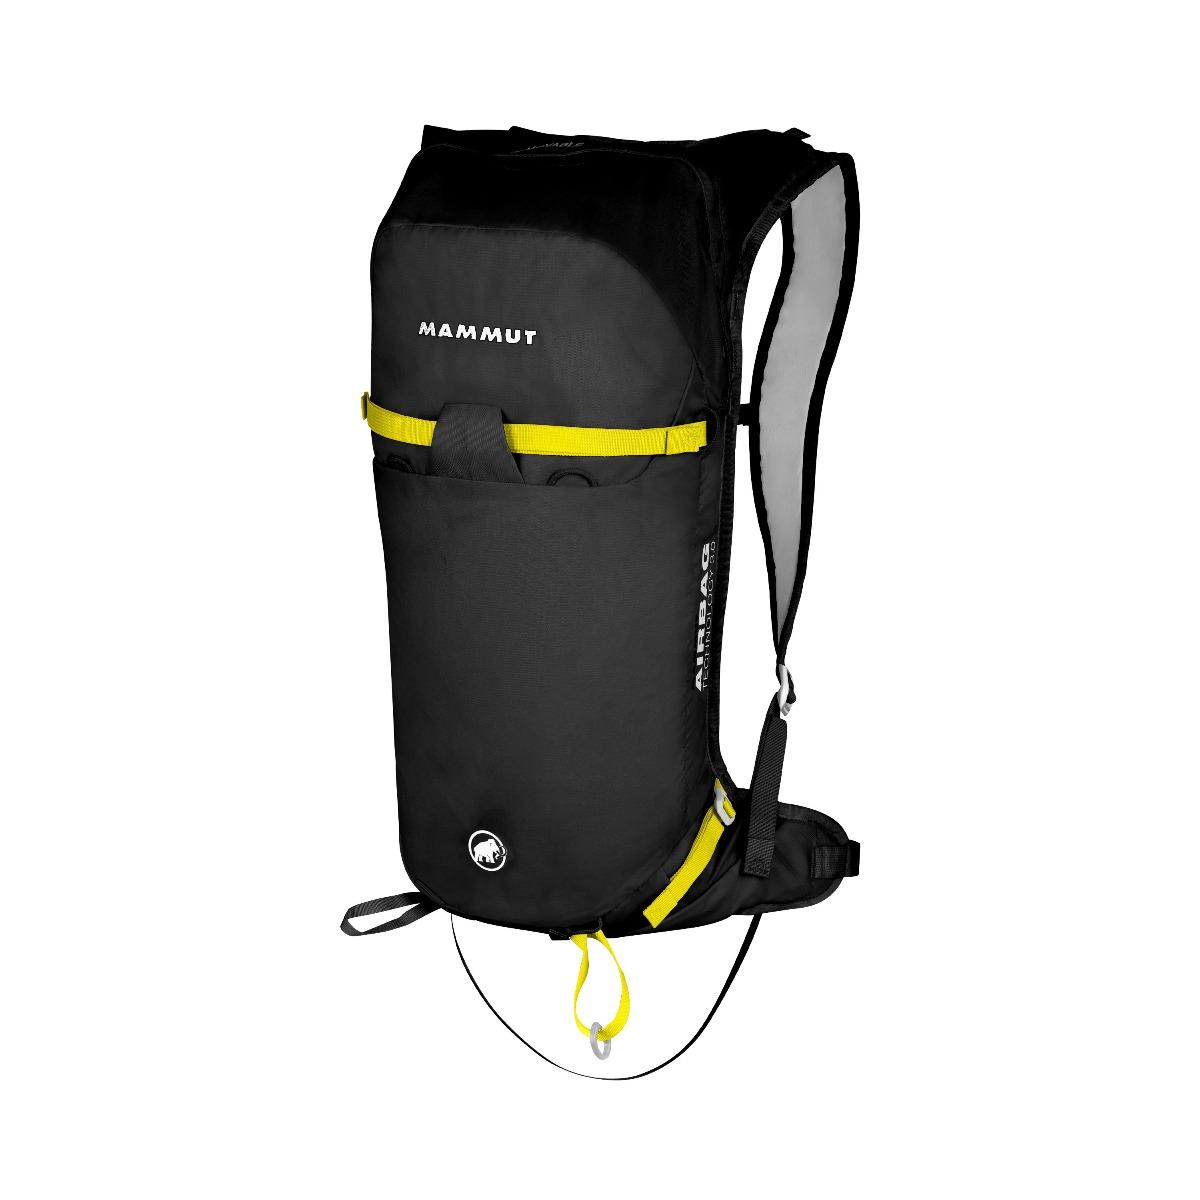 MAMMUT Ultralight Removable Airbag 3. 00150 phantom 20